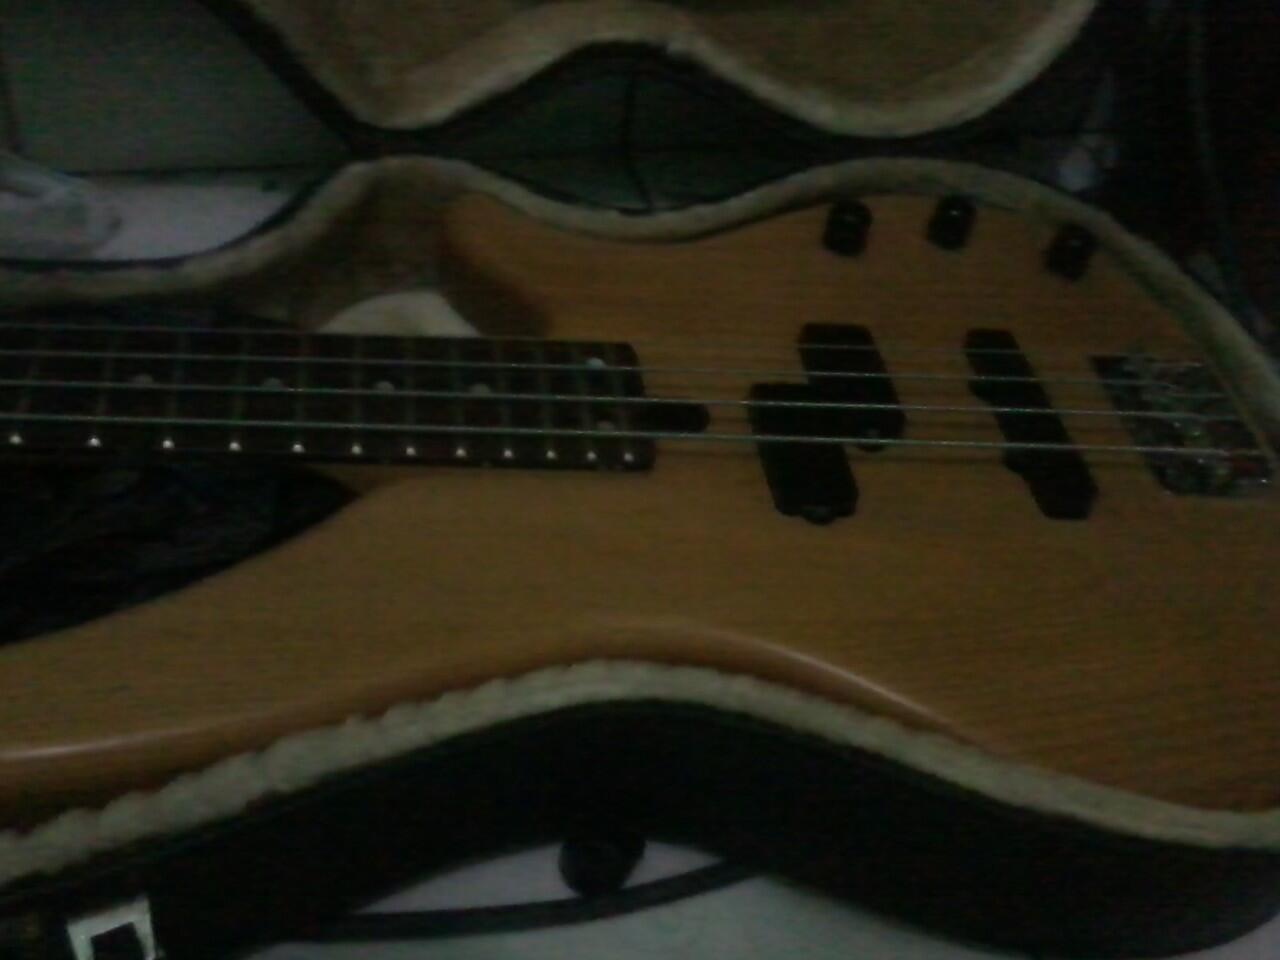 Bass Yamaha RBX 270J + Hardcase + Preamp